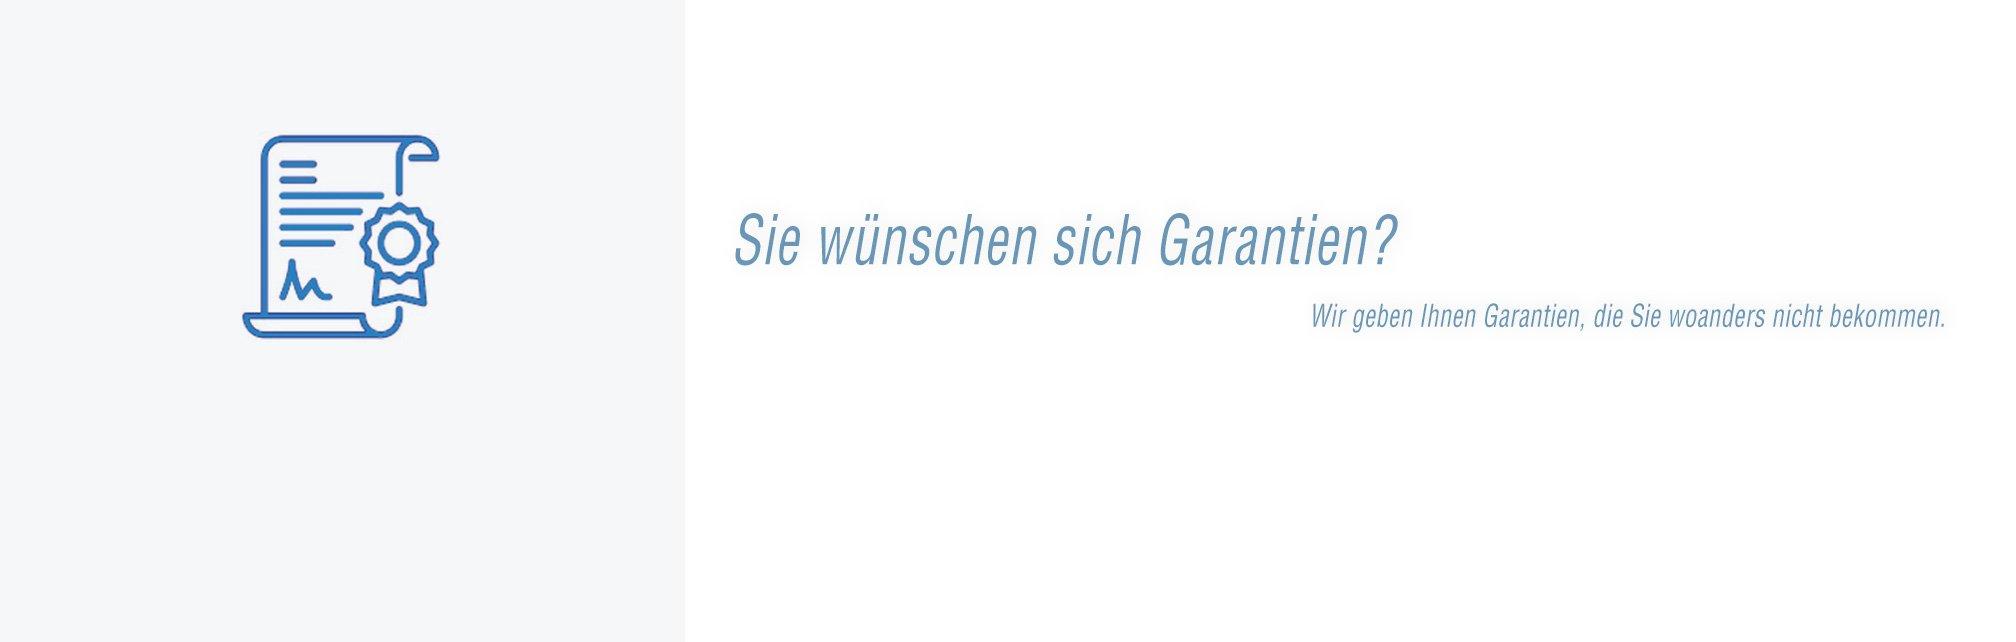 Garantie der Verbraucher Genossenschaft eG Berlin